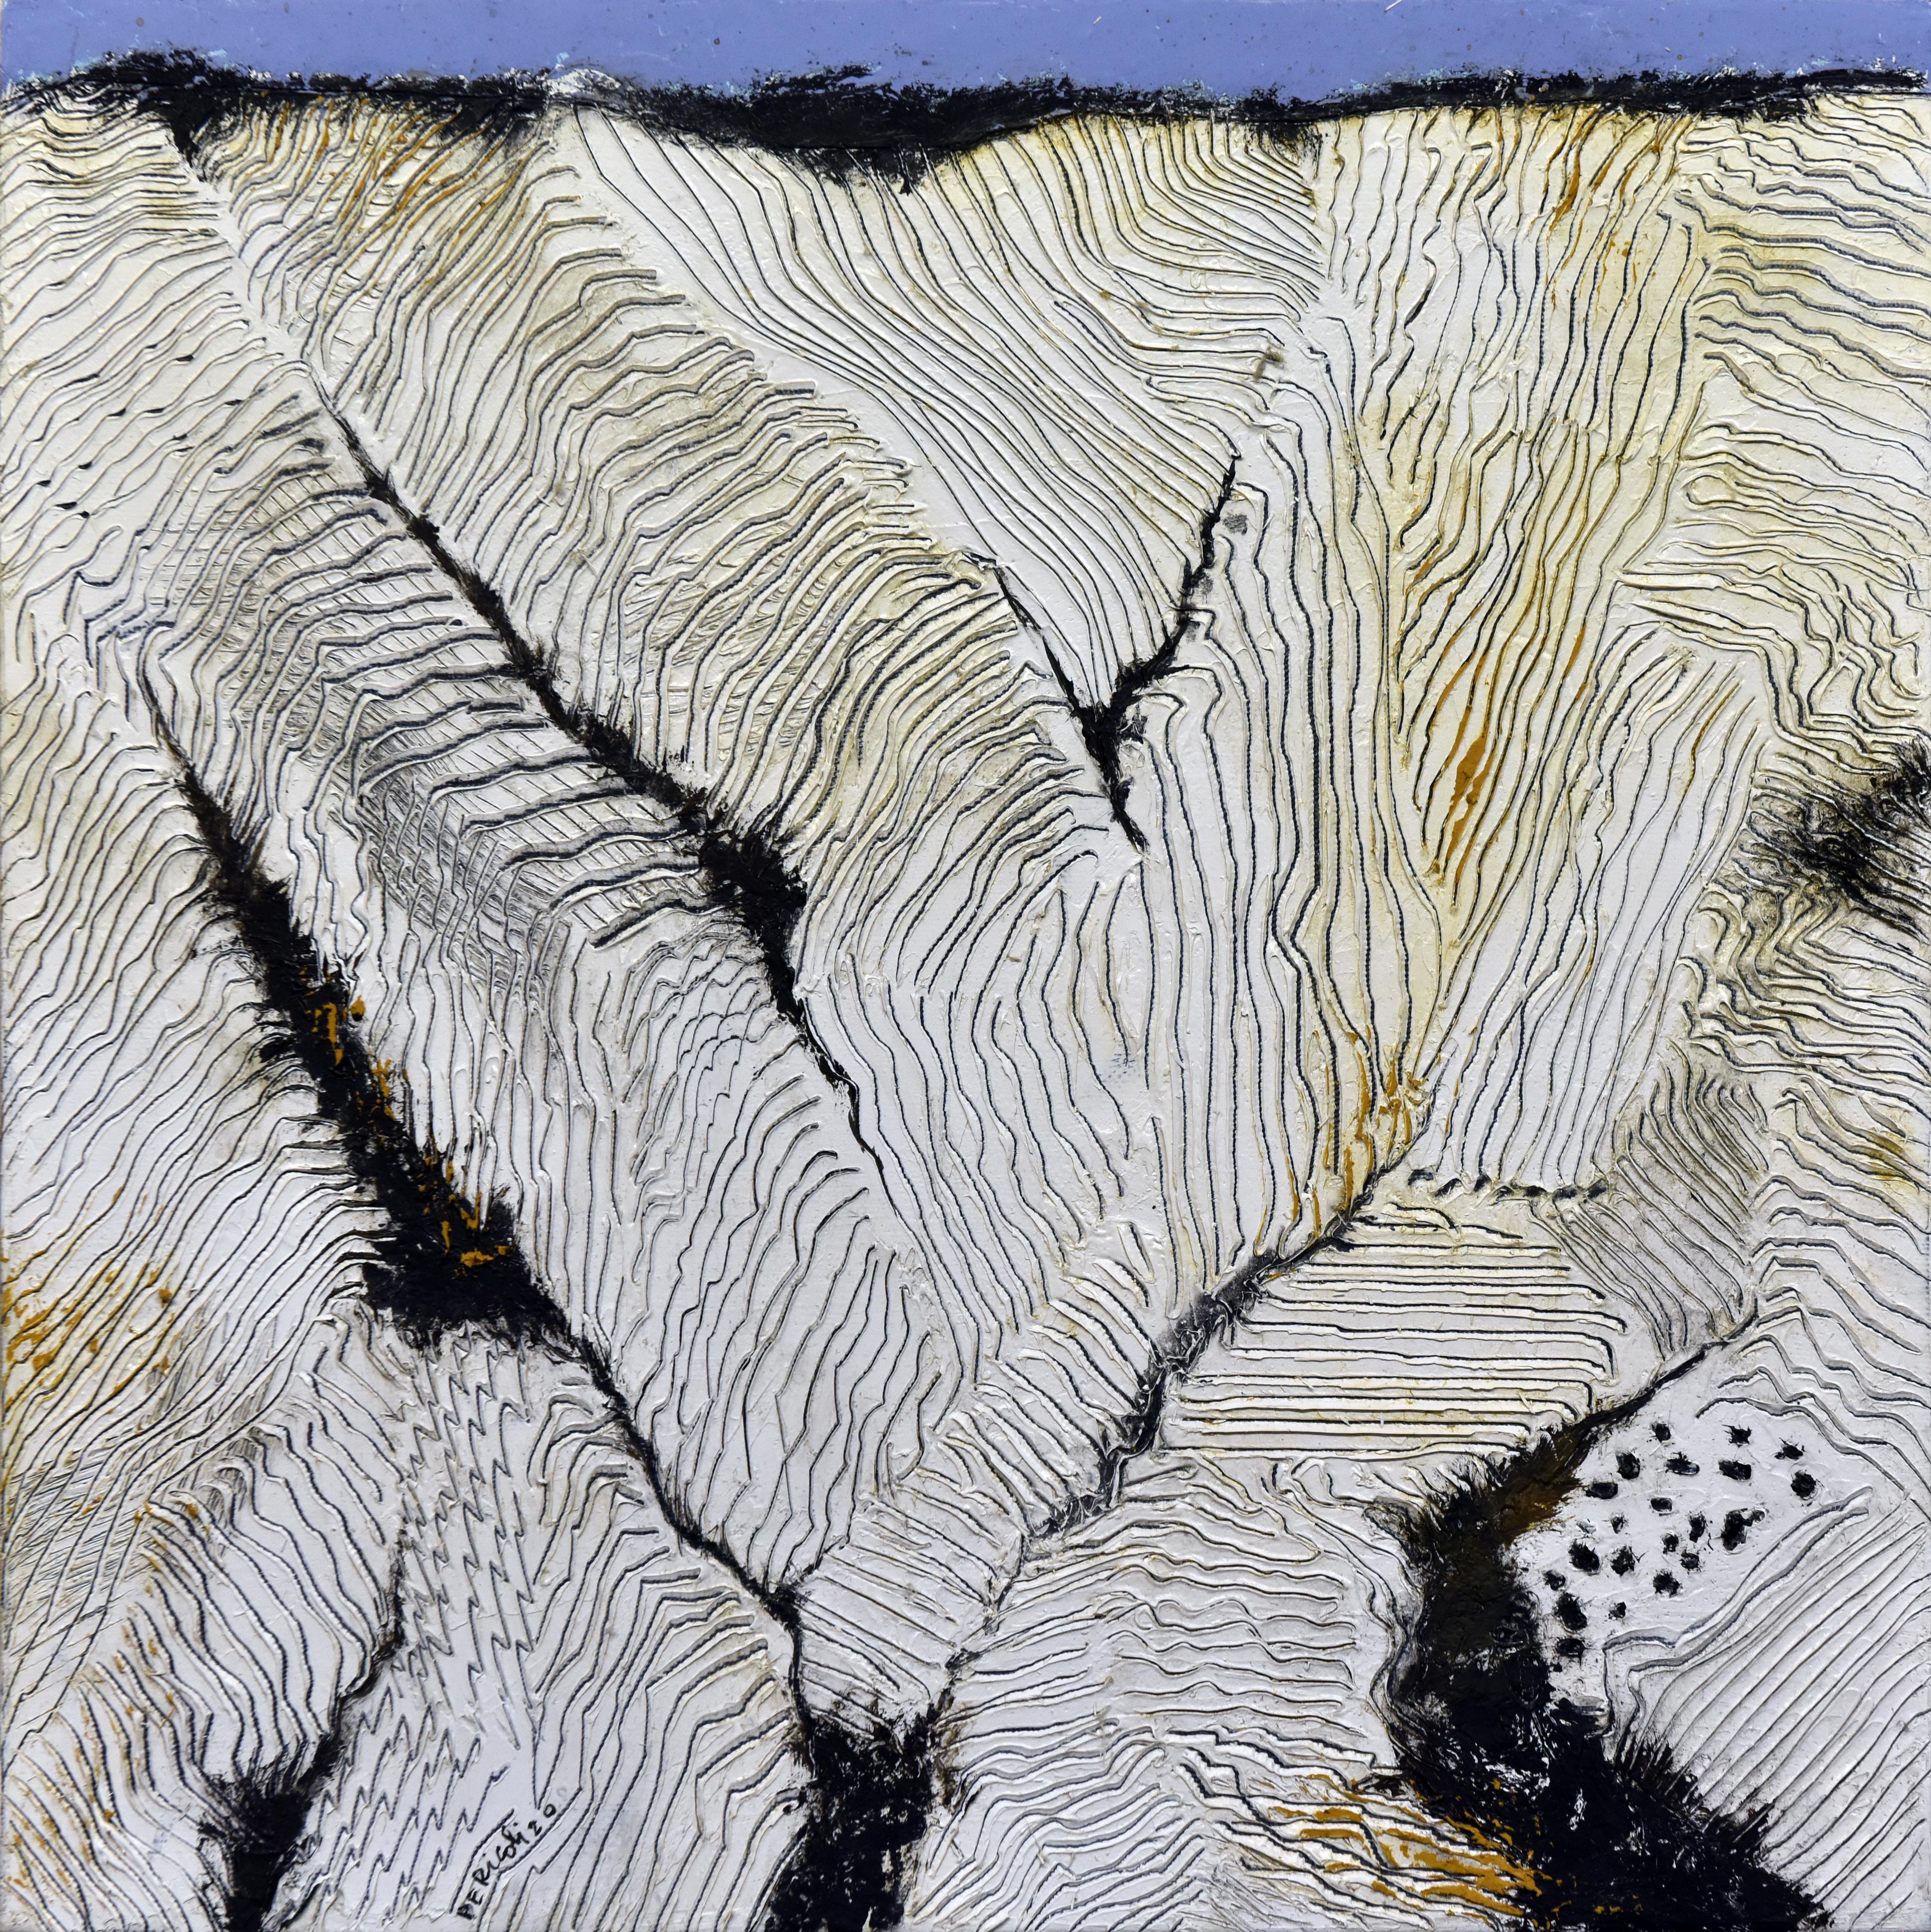 Tullio Pericoli, I fossi, 2020, olio su tela, 30 x 30 cm. (in Arte a parte, p. 29)